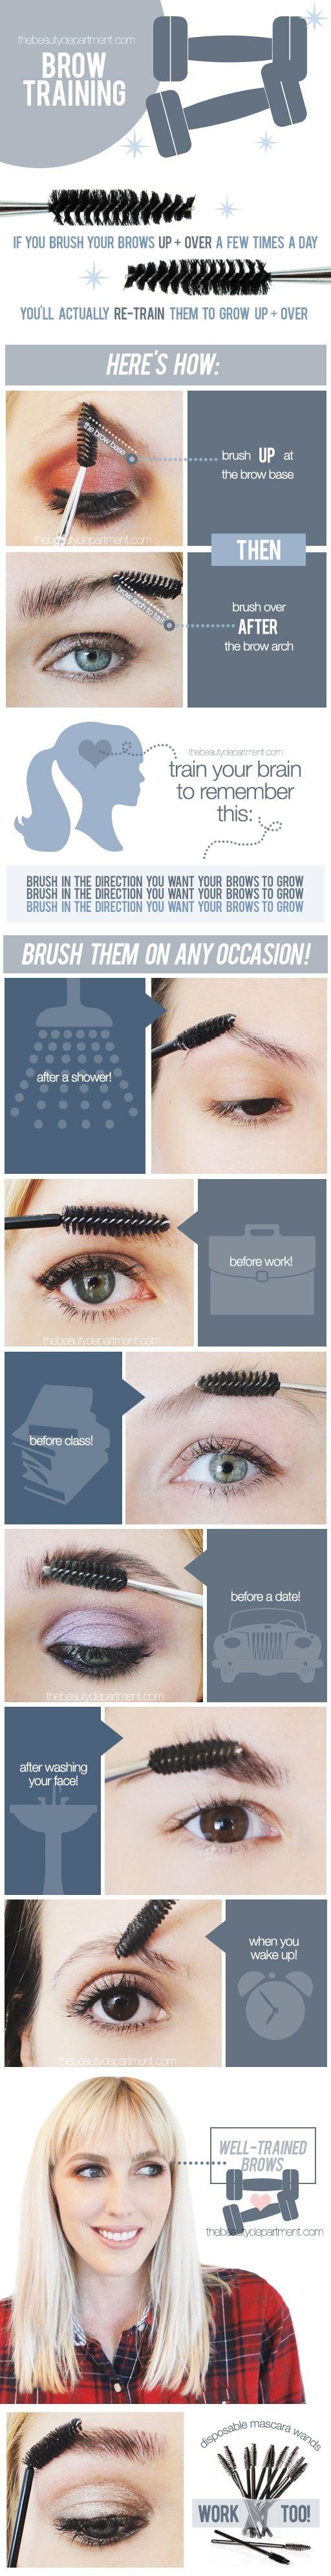 makeupandbody:perfectbrows